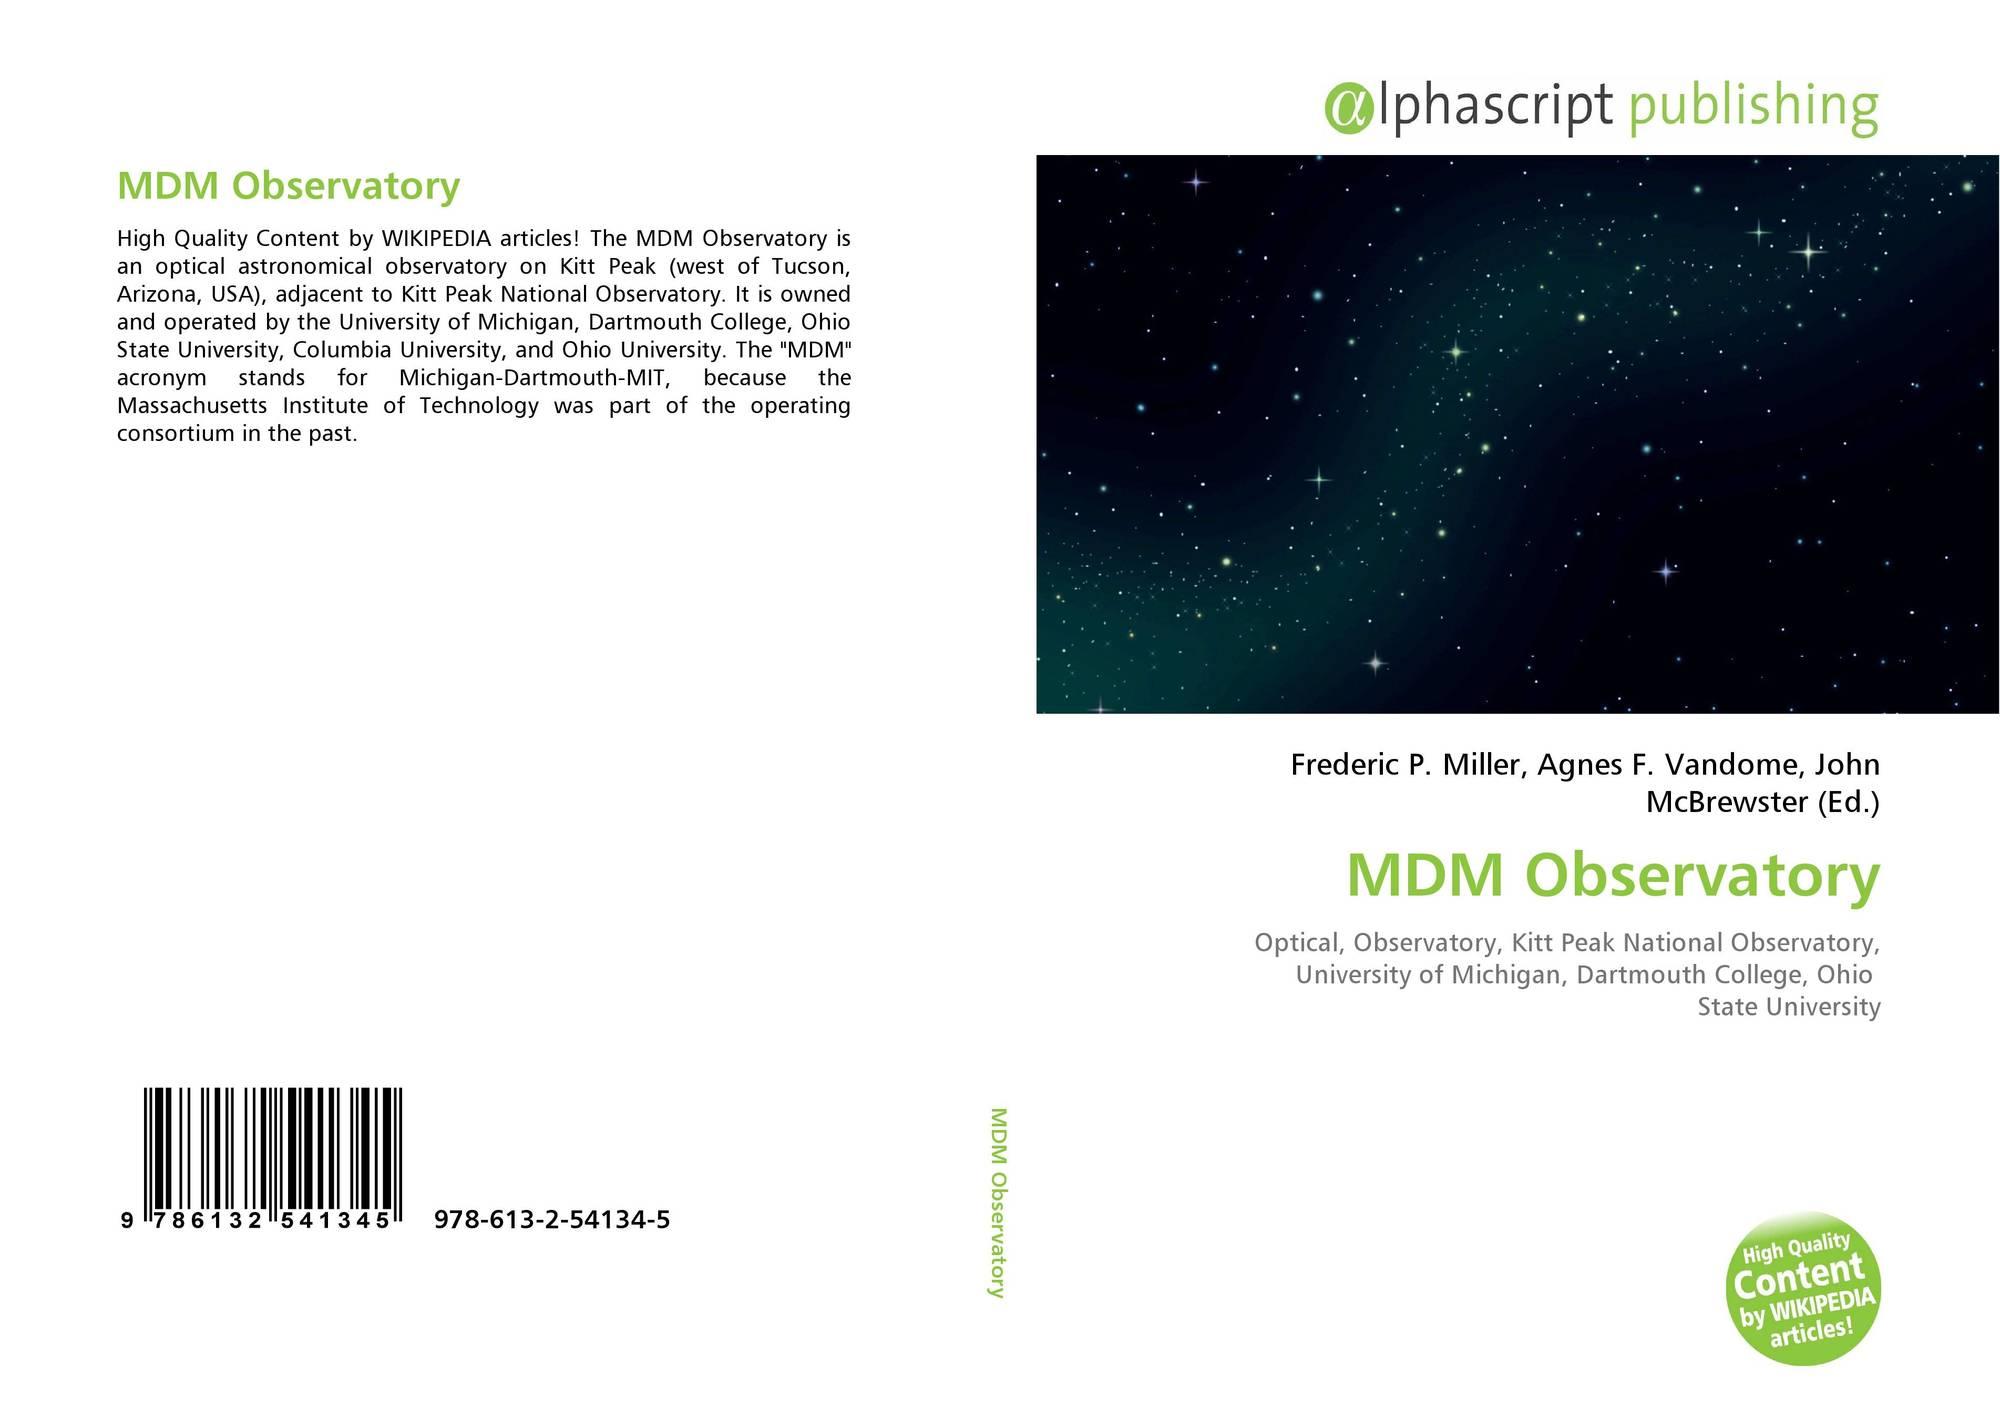 MDM Observatory, 978-613-2-54134-5, 6132541349 ,9786132541345